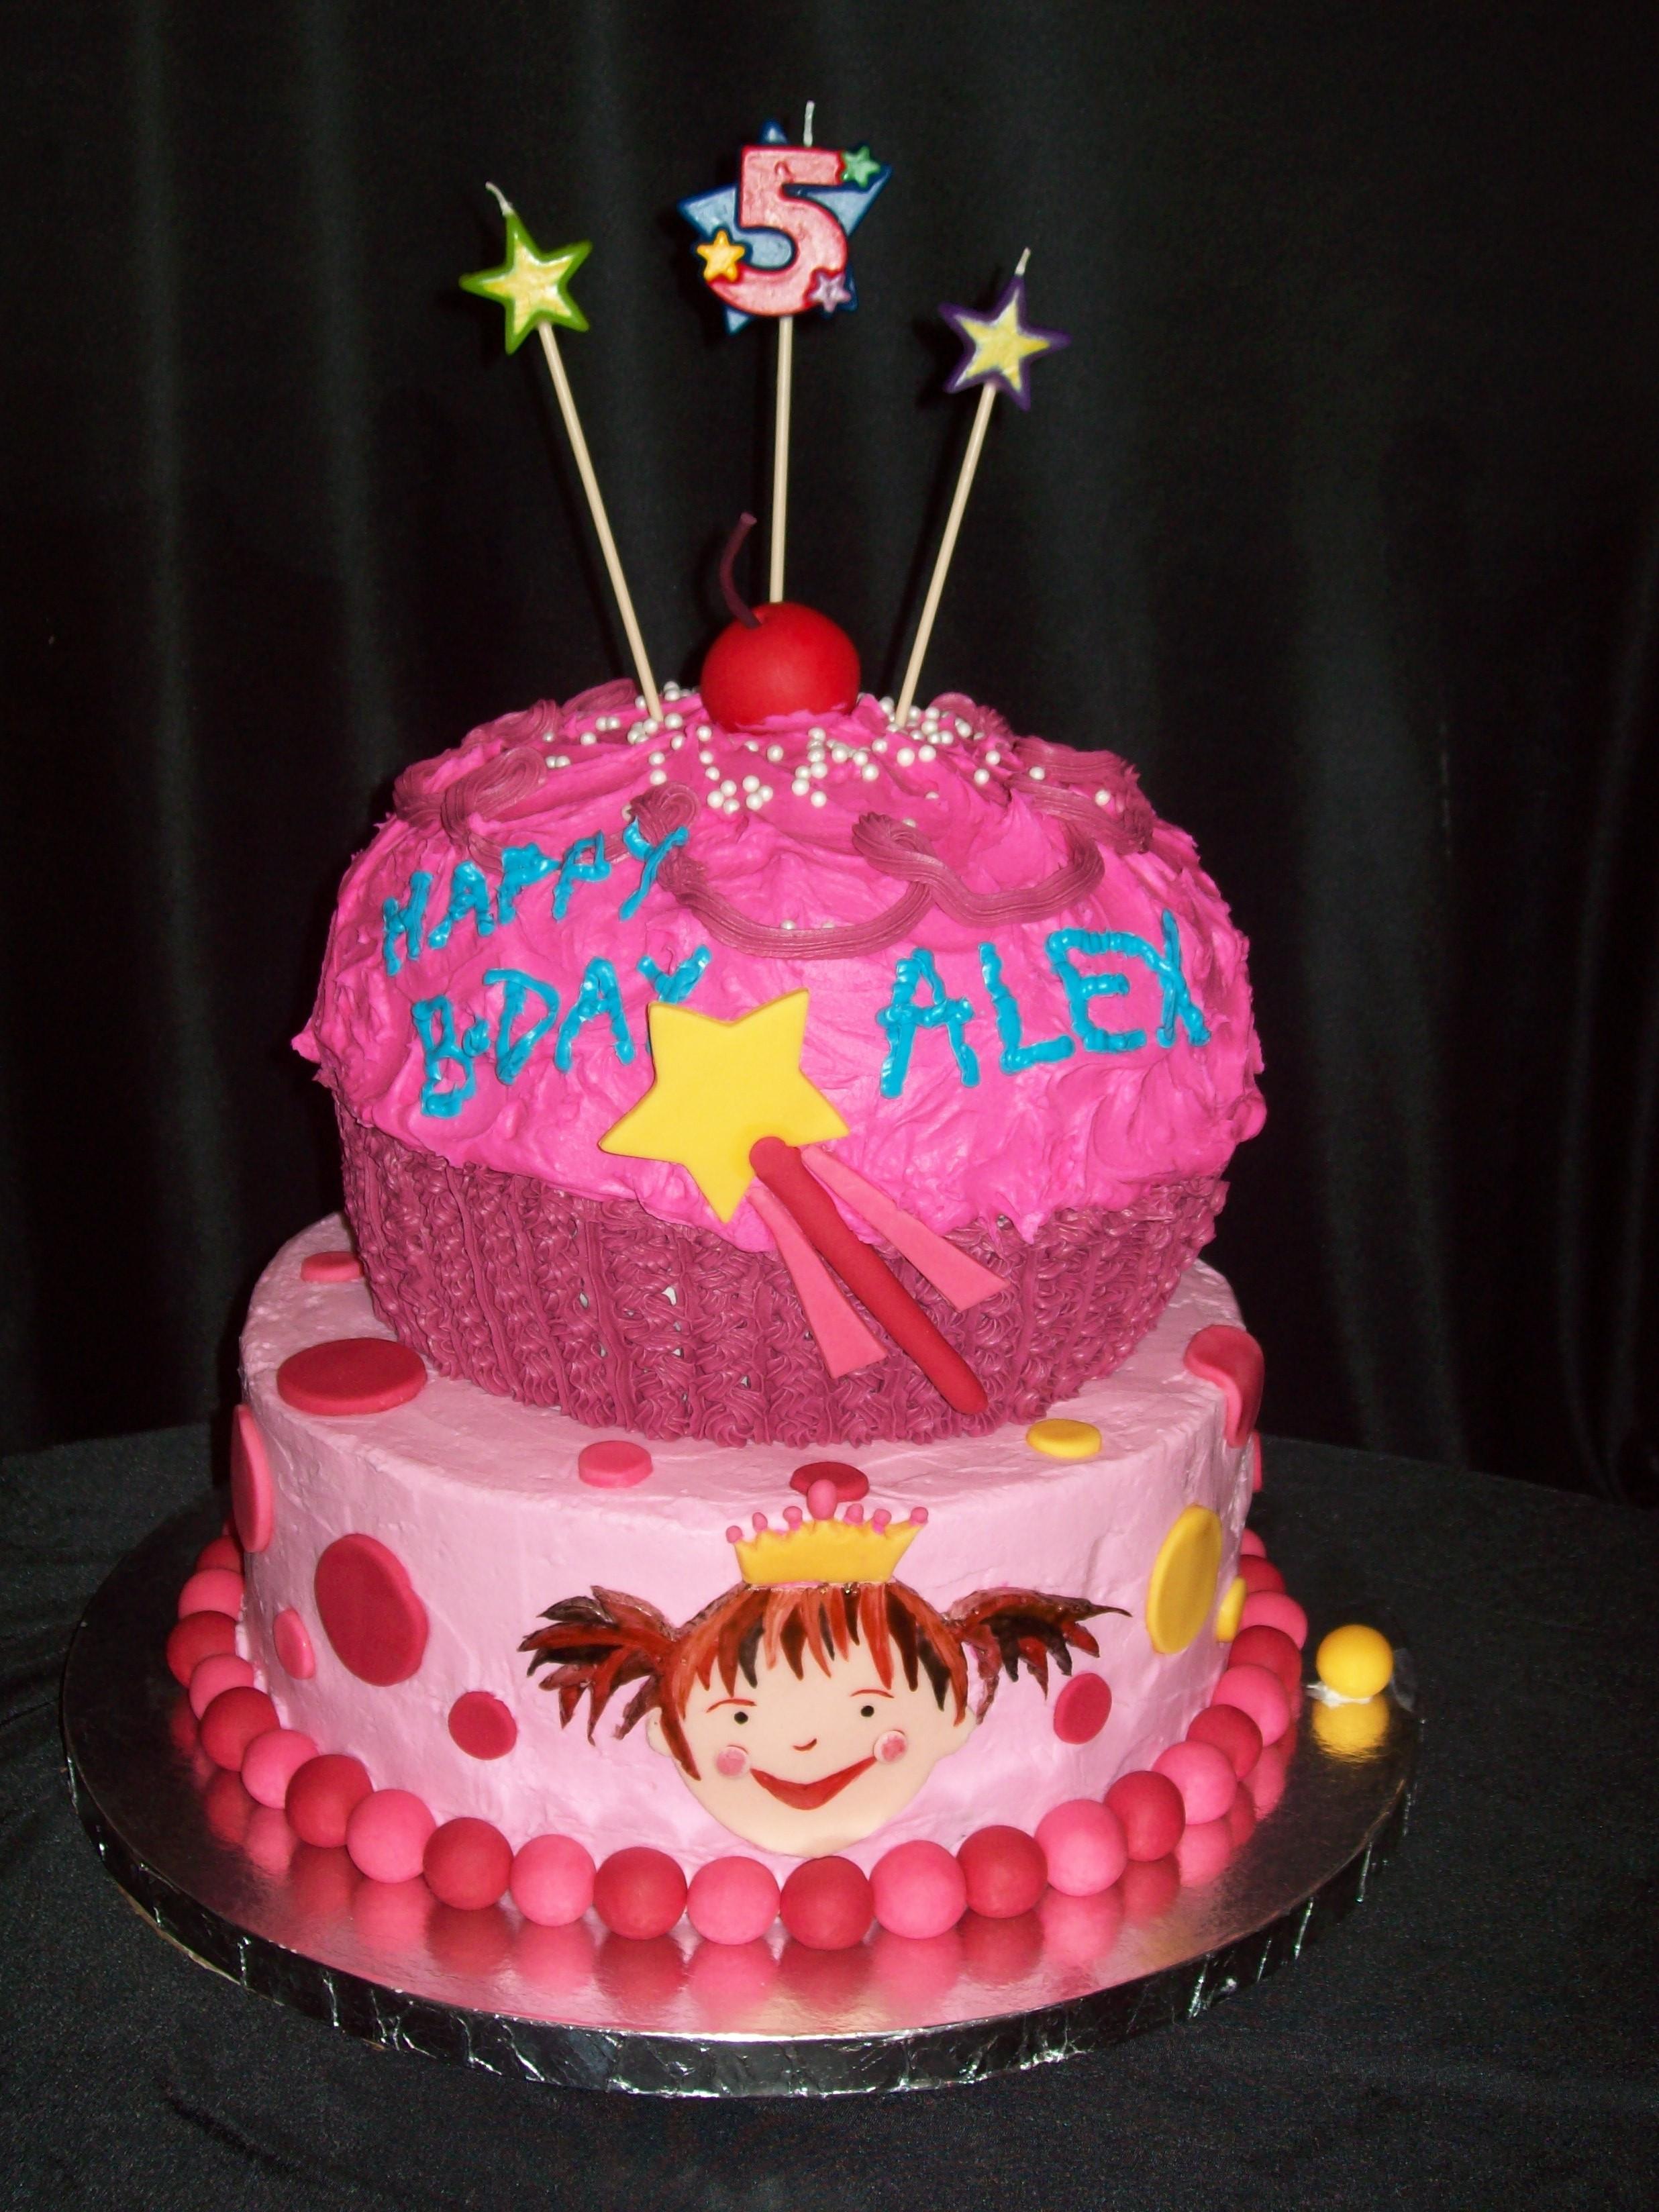 Pinkalicious Creative Cake Designs